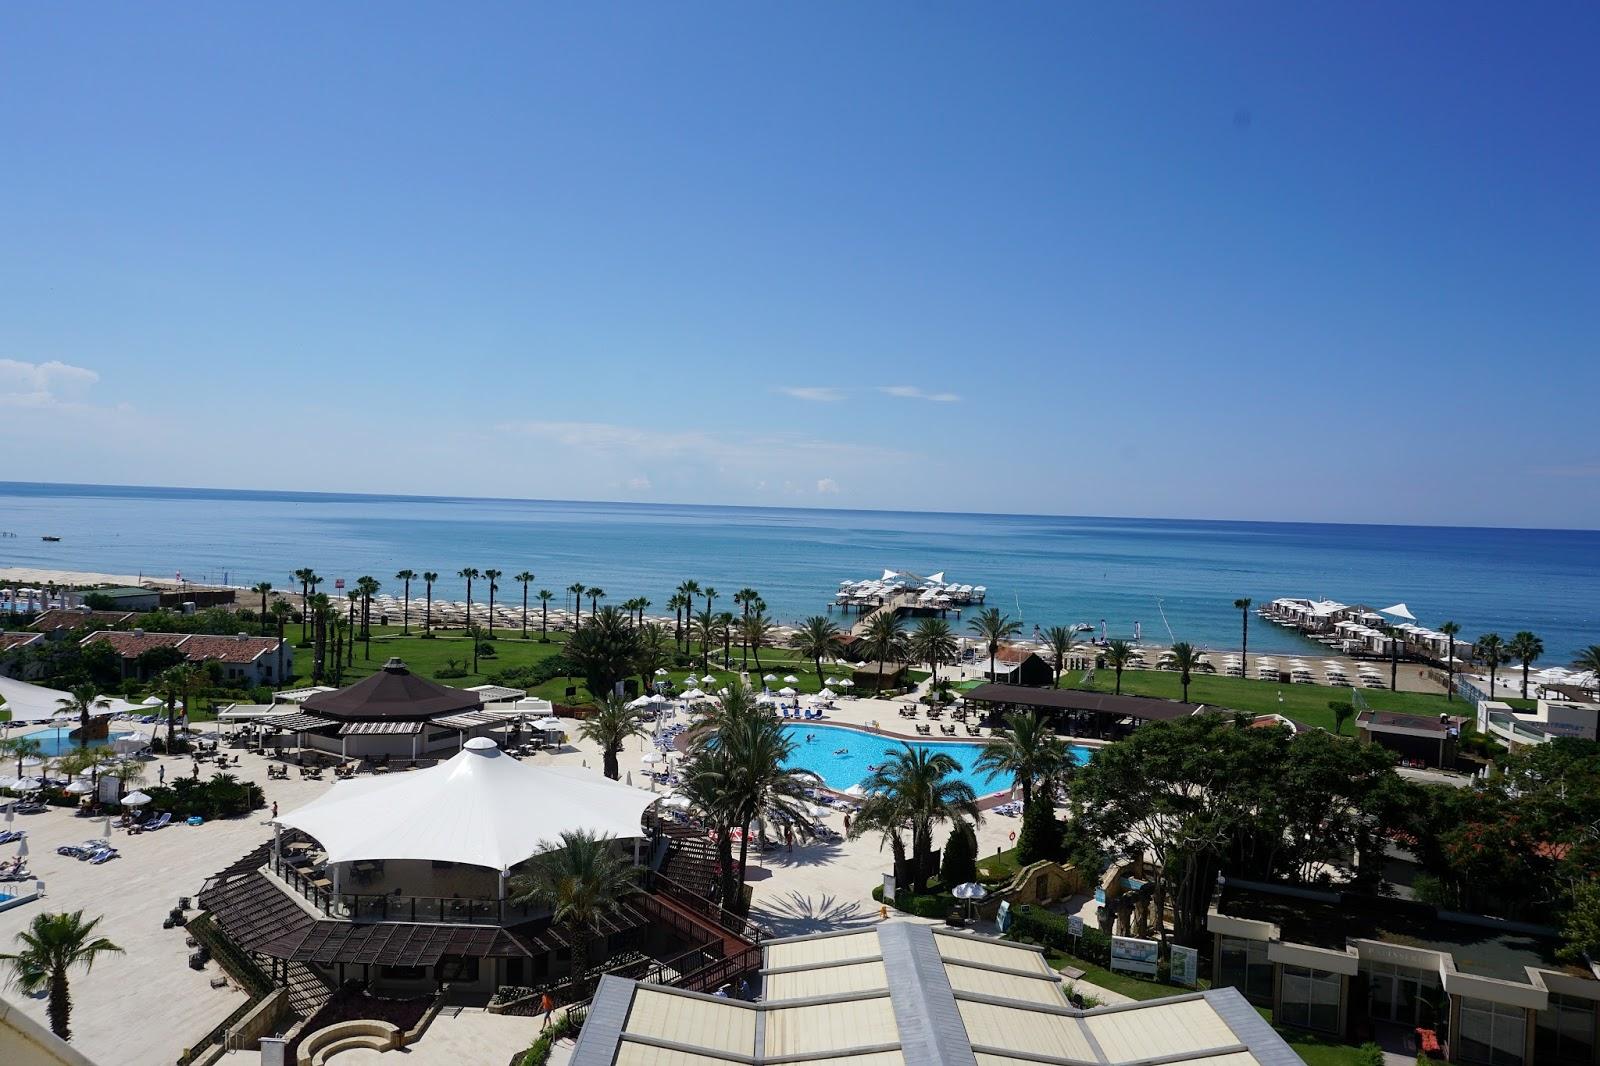 Sentido Hotel Turkey